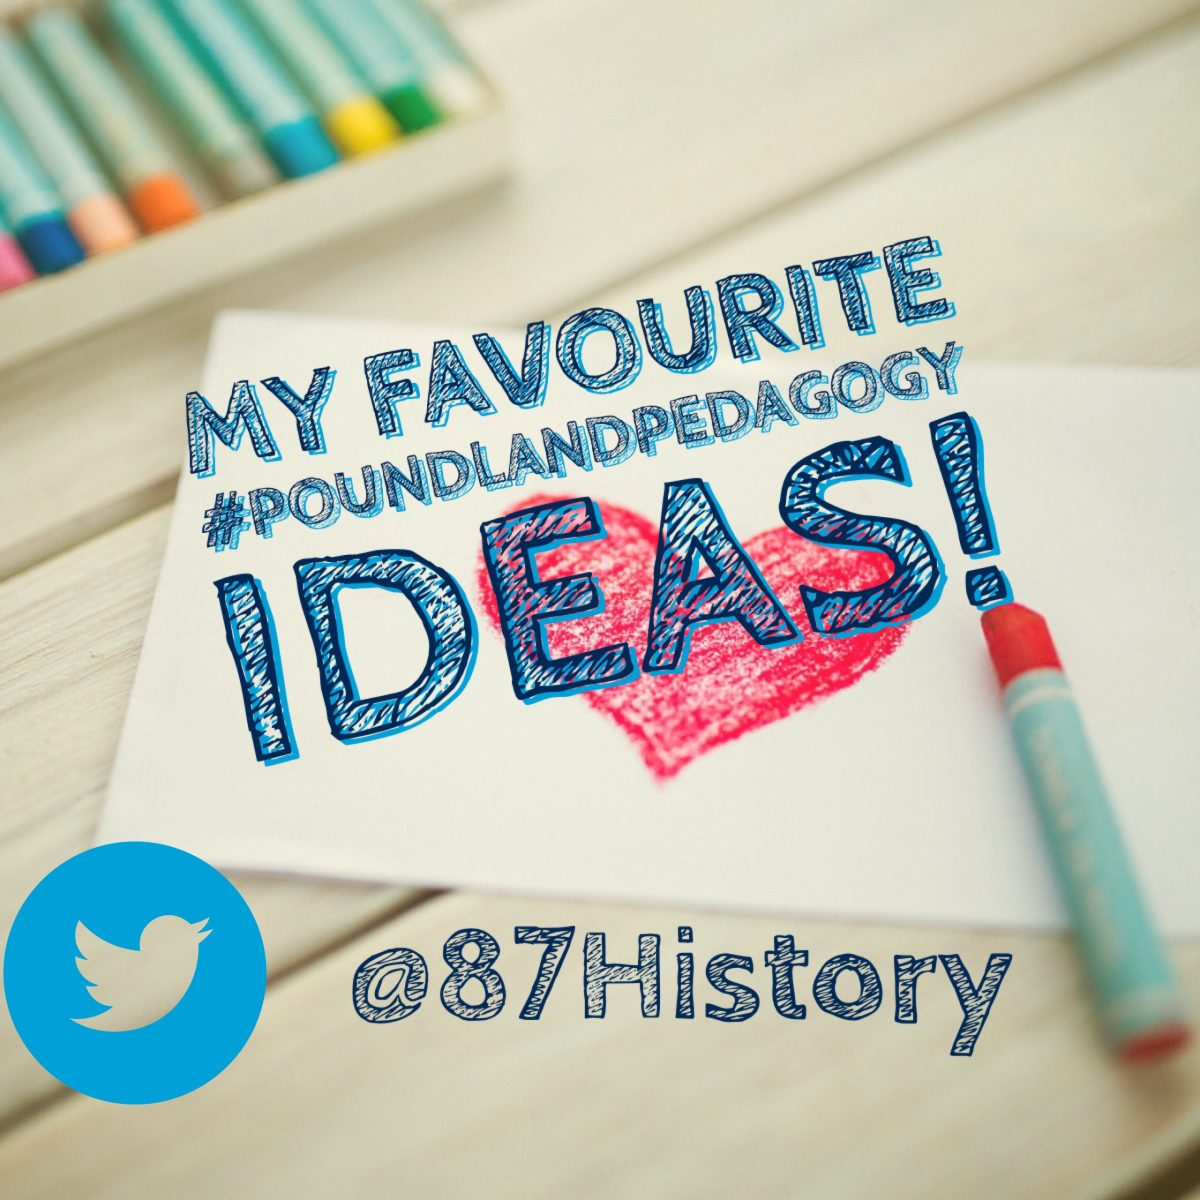 My favourite #Poundland Pedagogy ideas!